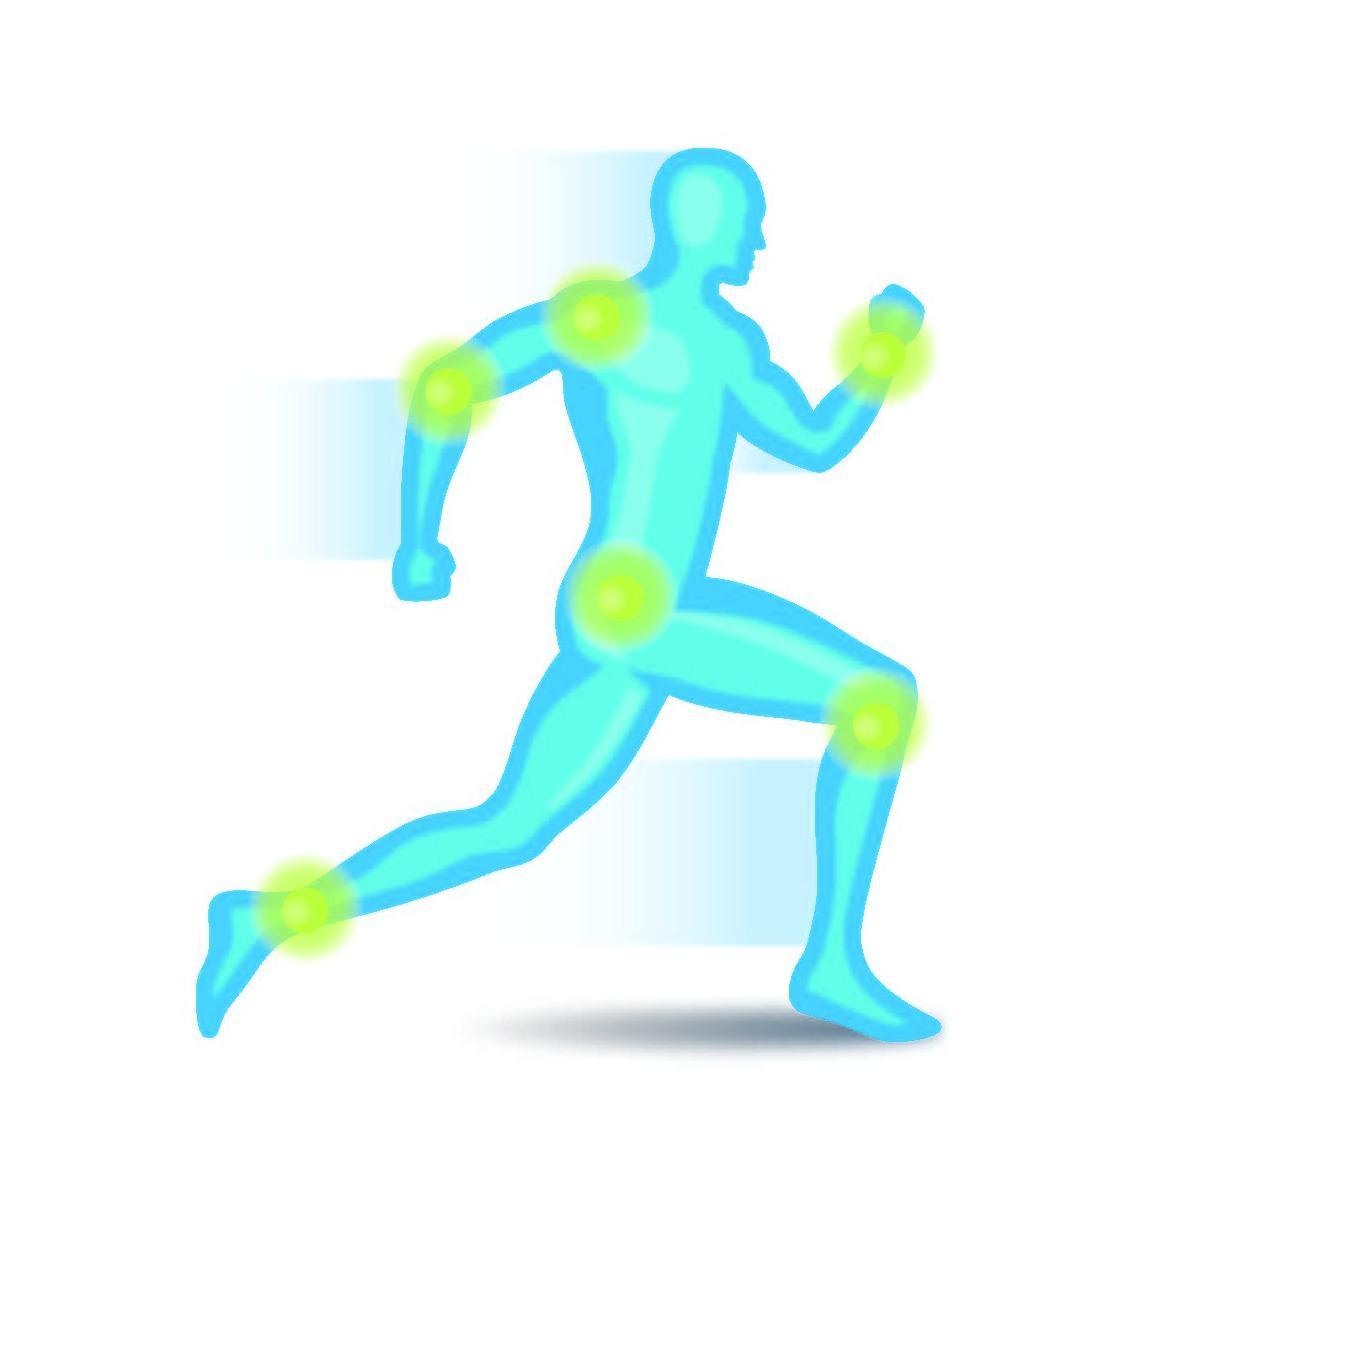 Advanced Orthopedics & Sports Medicine - Overland Park, KS 66213 - (816)525-2840 | ShowMeLocal.com